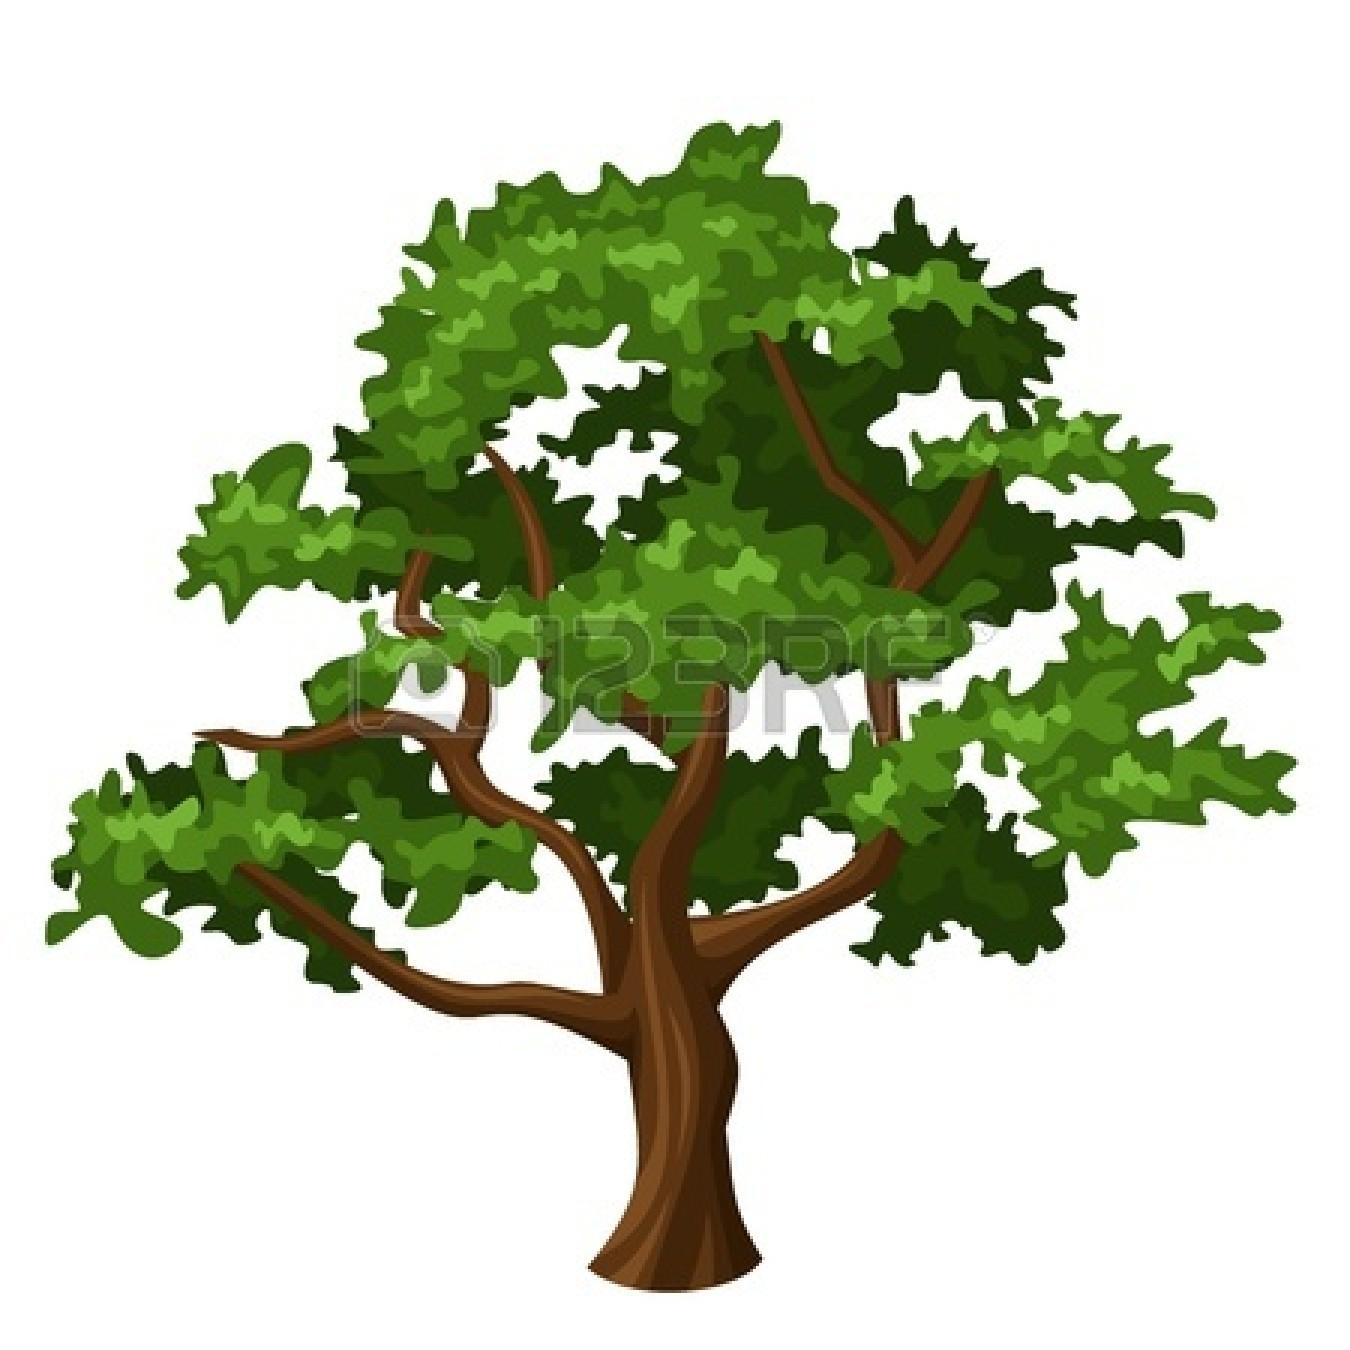 Oaktree clipart picture freeuse Free Oak Tree Clipart, Download Free Clip Art, Free Clip Art on ... picture freeuse